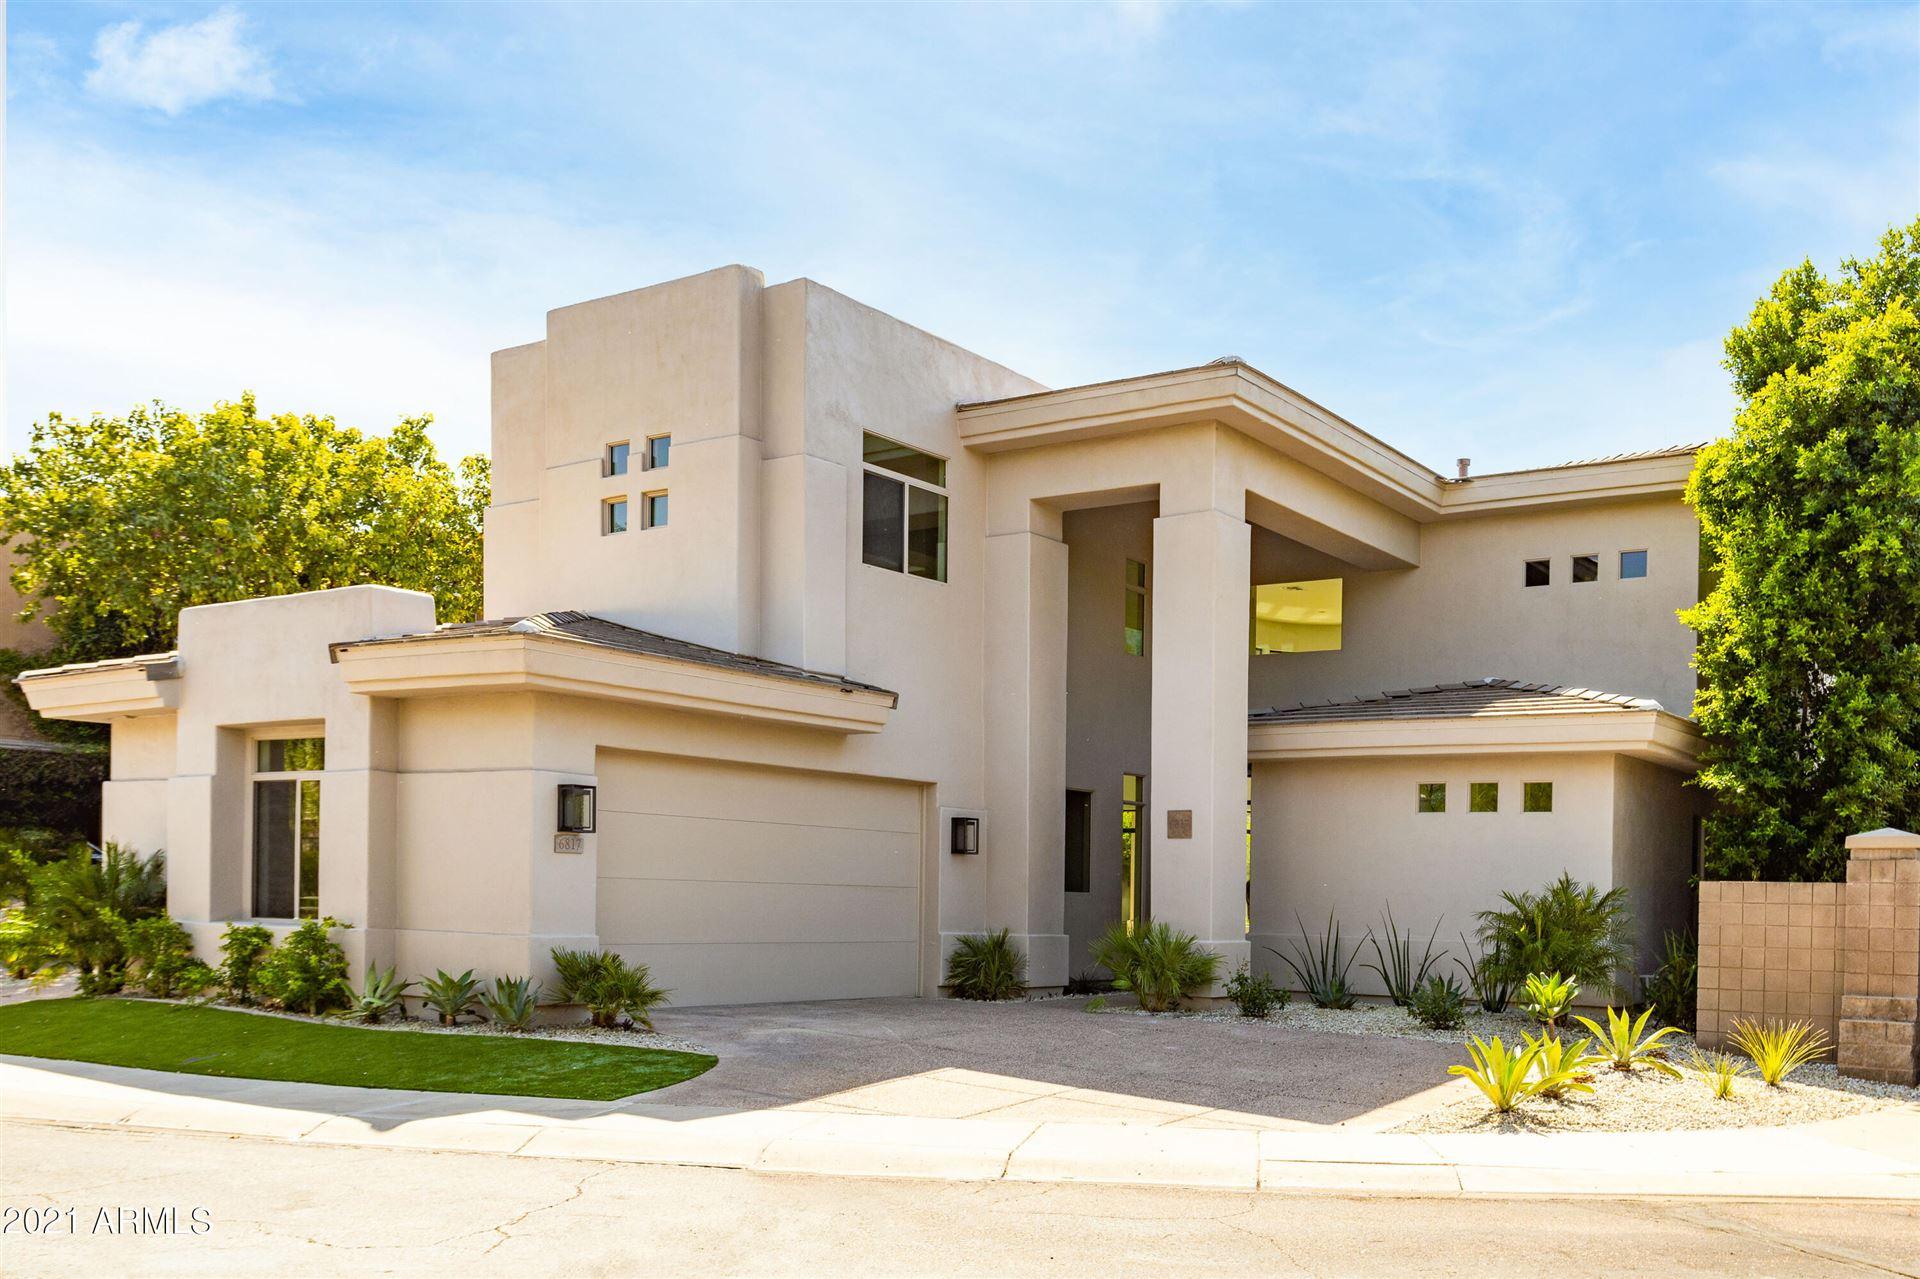 6817 E MONTREAL Place, Scottsdale, AZ 85254 - MLS#: 6297950